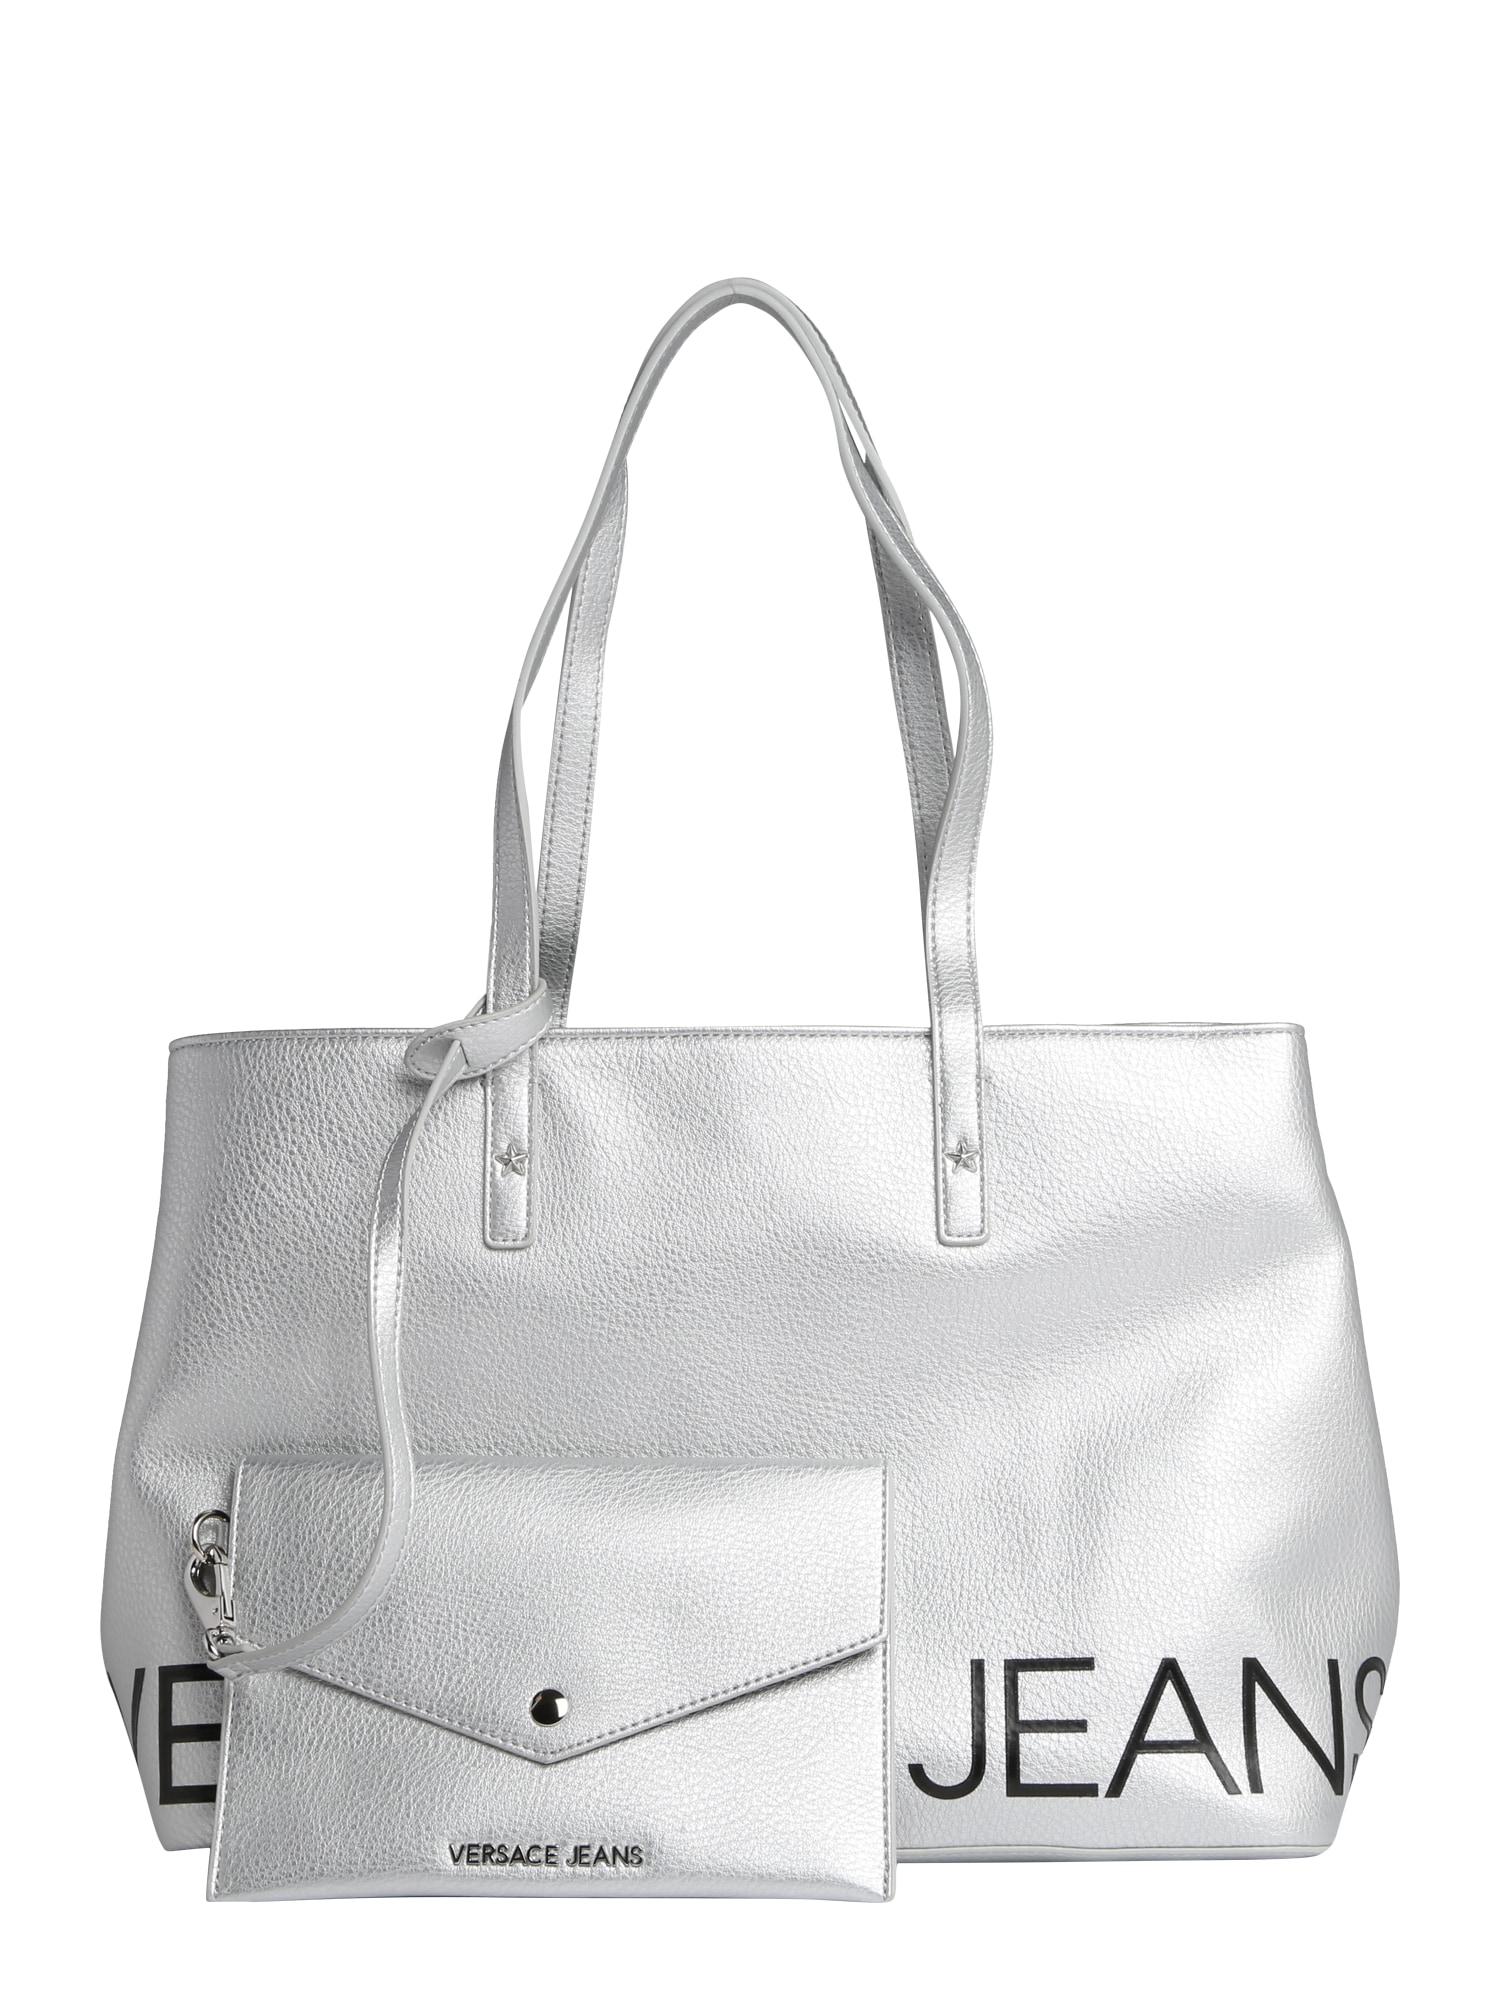 Kabelka VTBBB1 stříbrná Versace Jeans